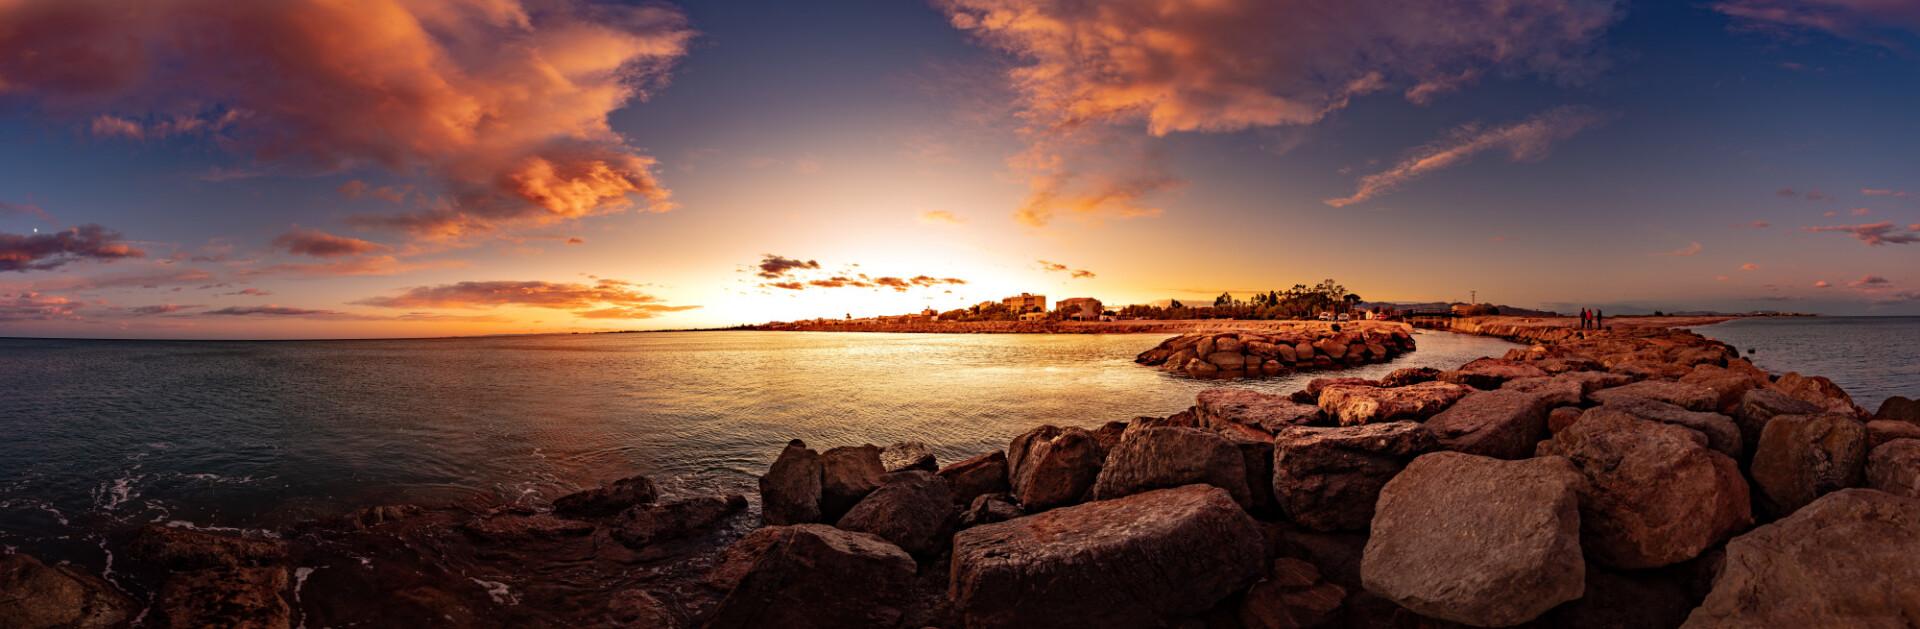 Sunset over Casablanca in Spain Seascape Panorama